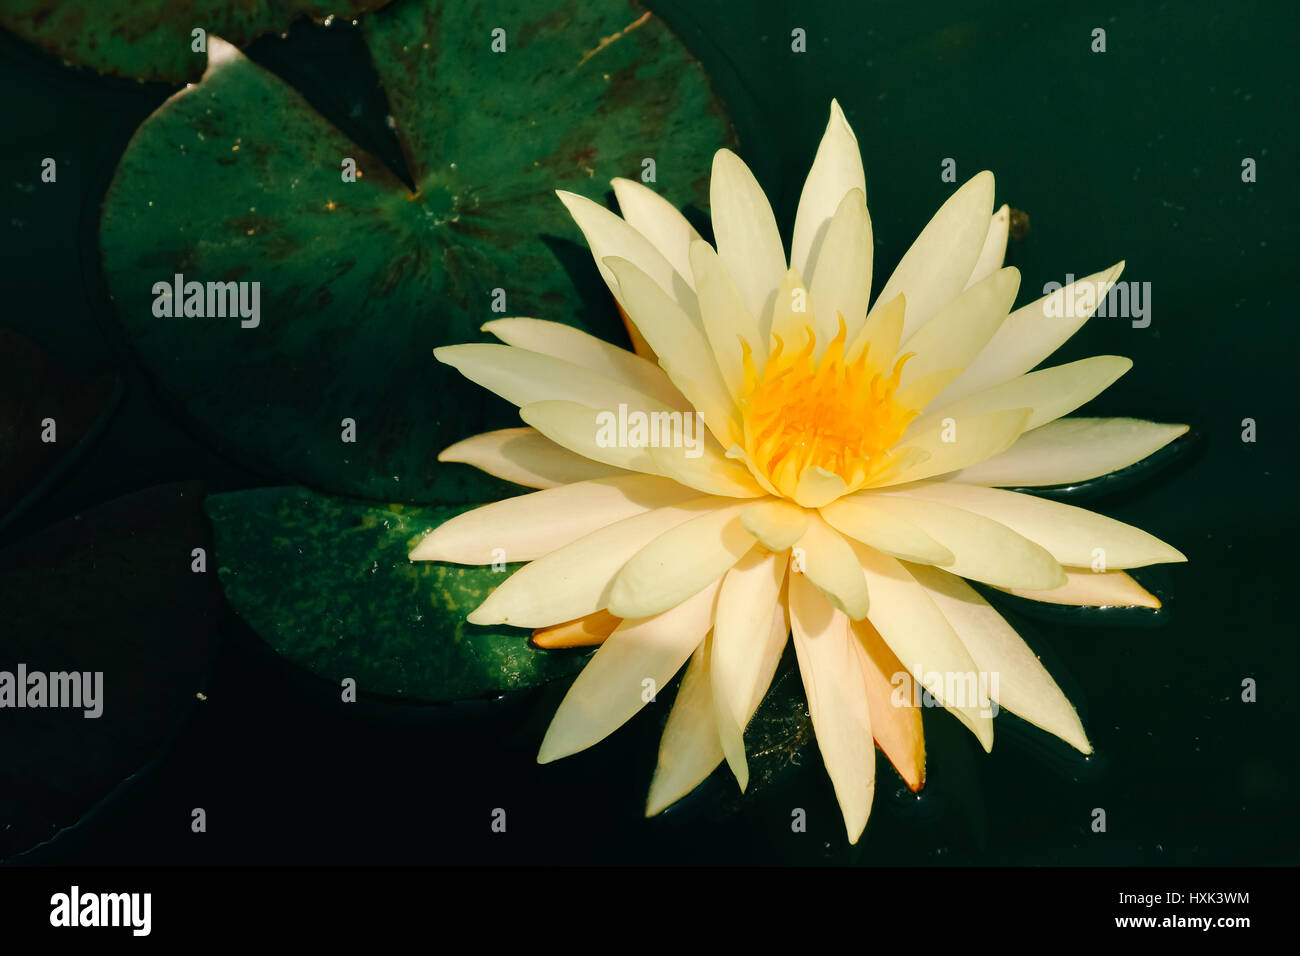 Lotus flower - Stock Image